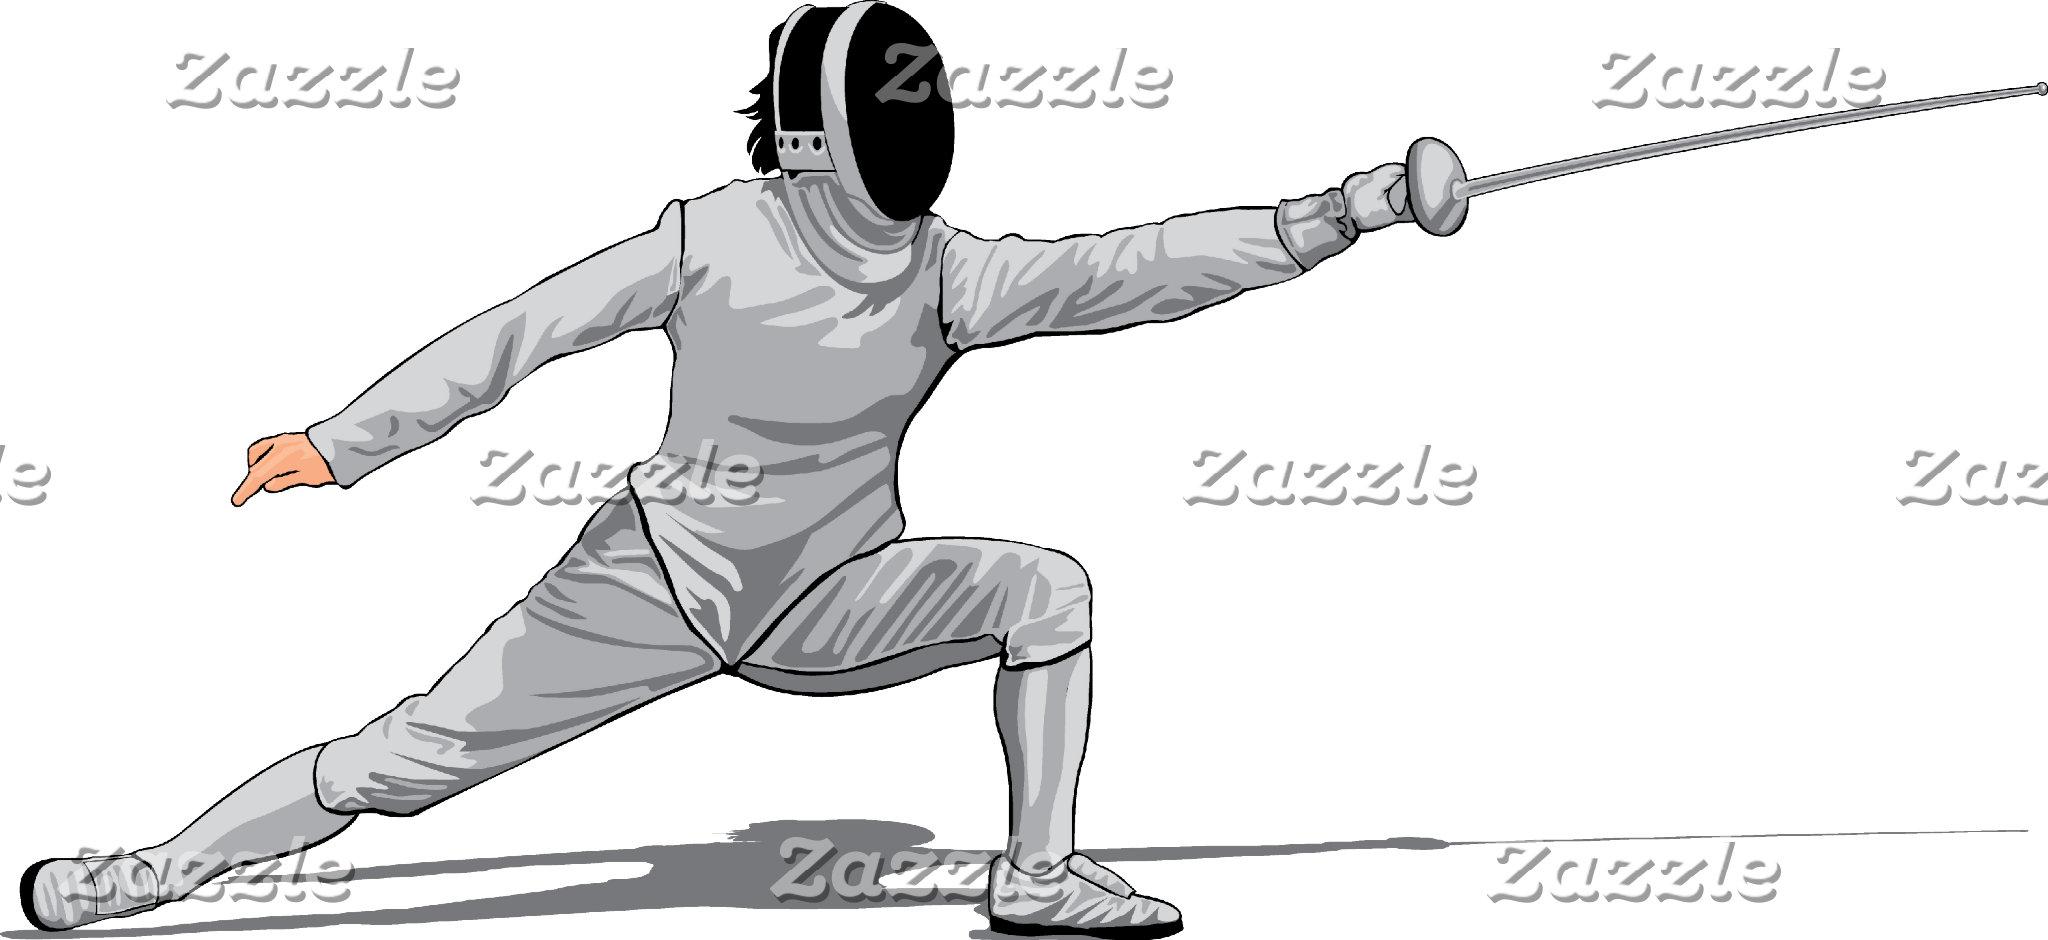 Sports Hobbies